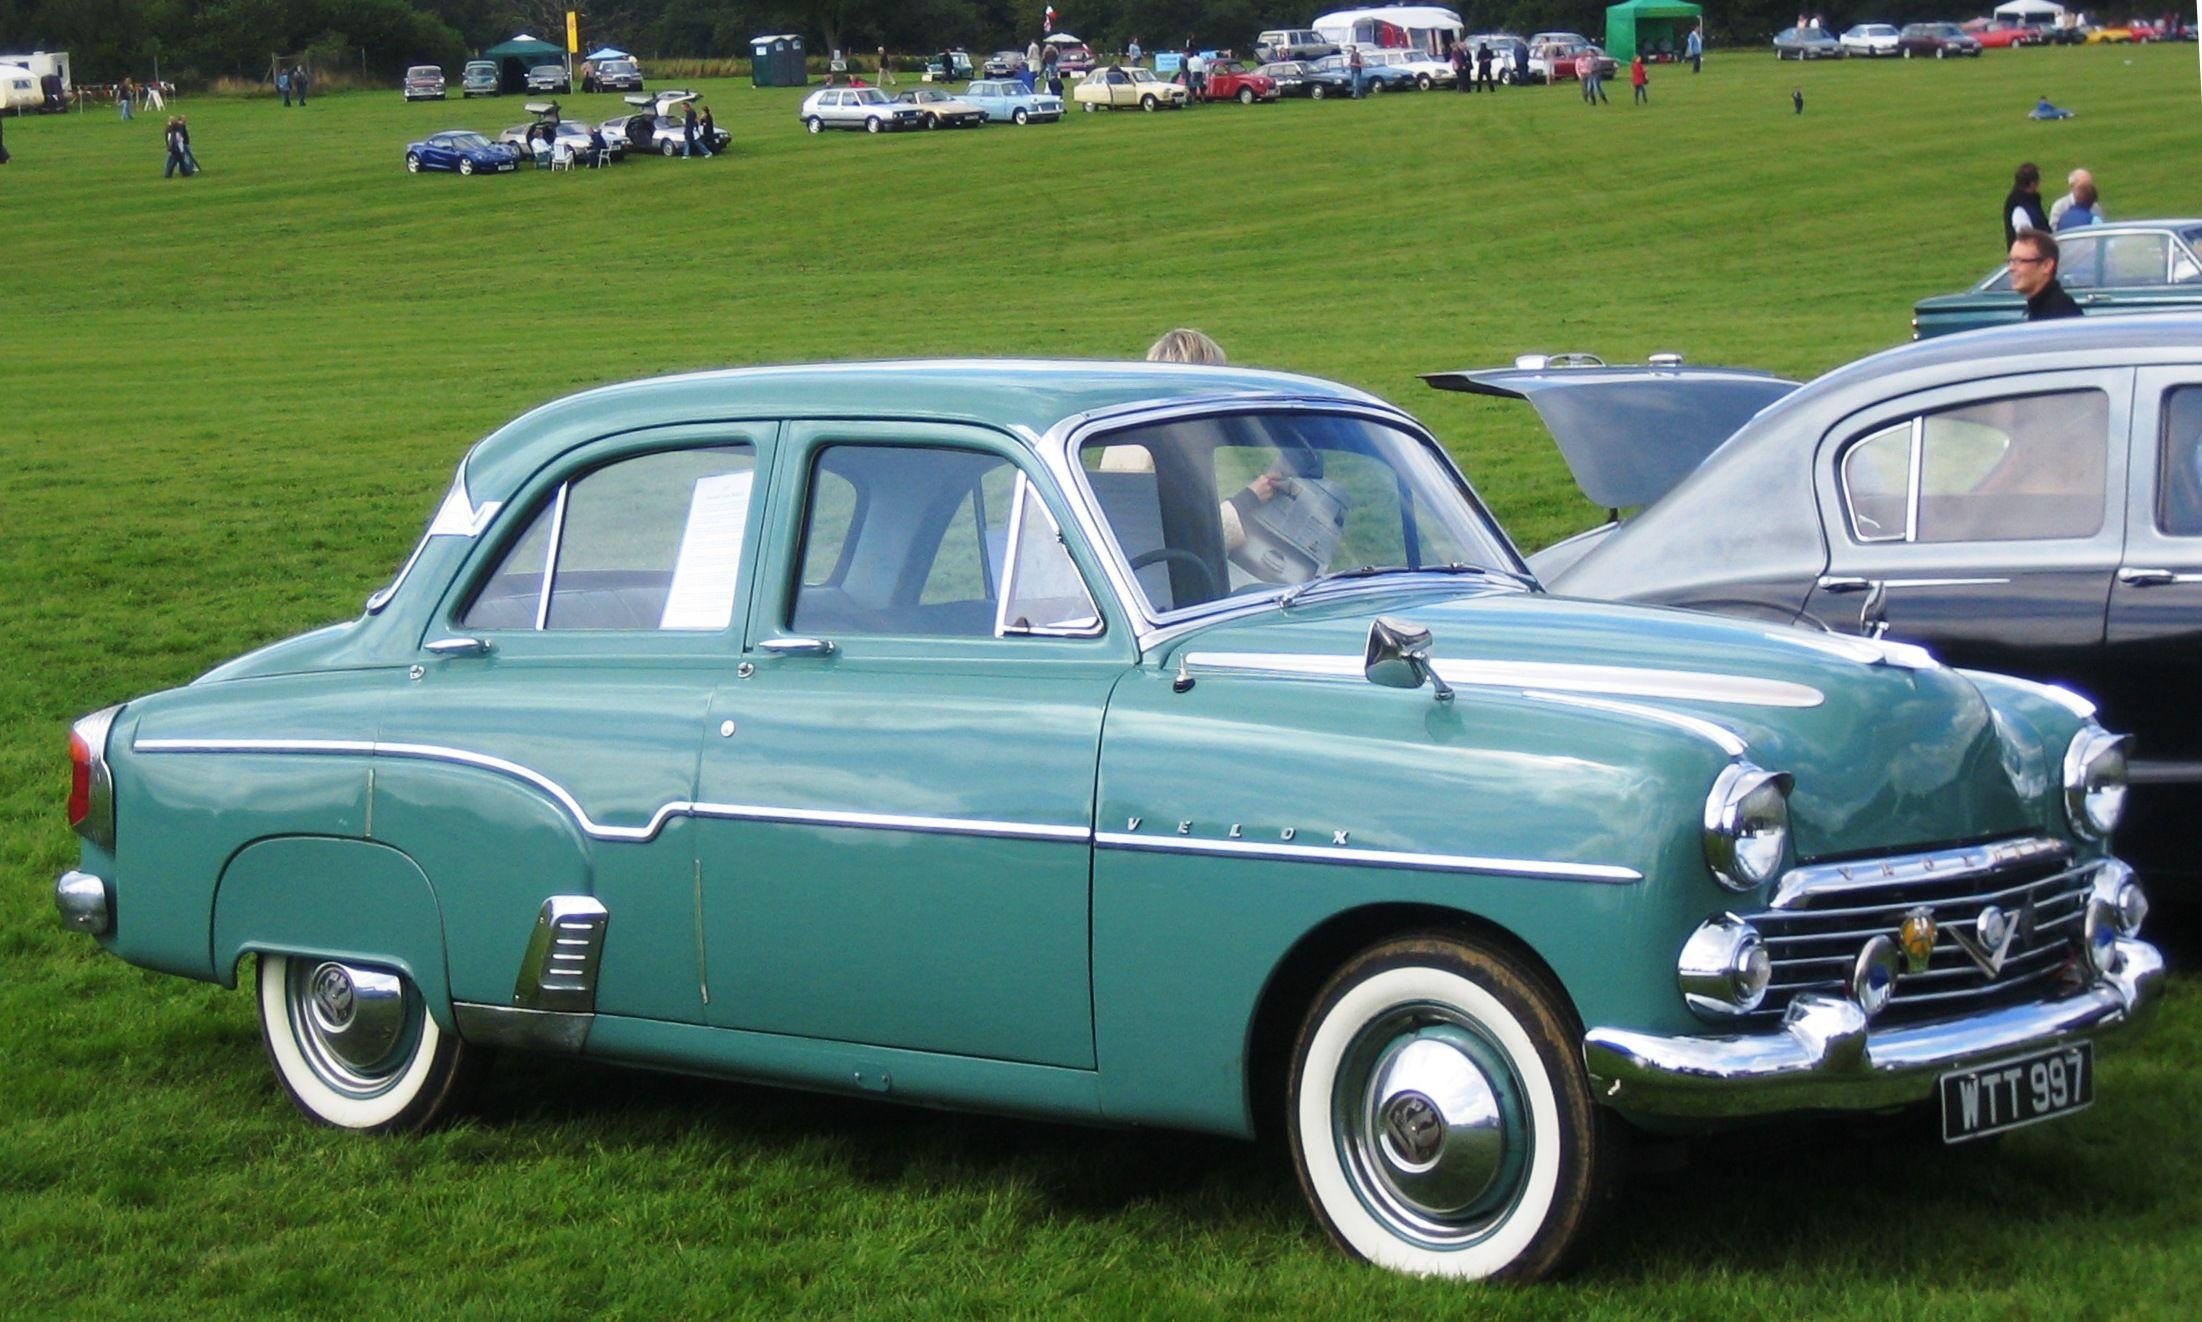 (19511952) Vauxhall Velox EIP Vauxhall, Vauxhall motors